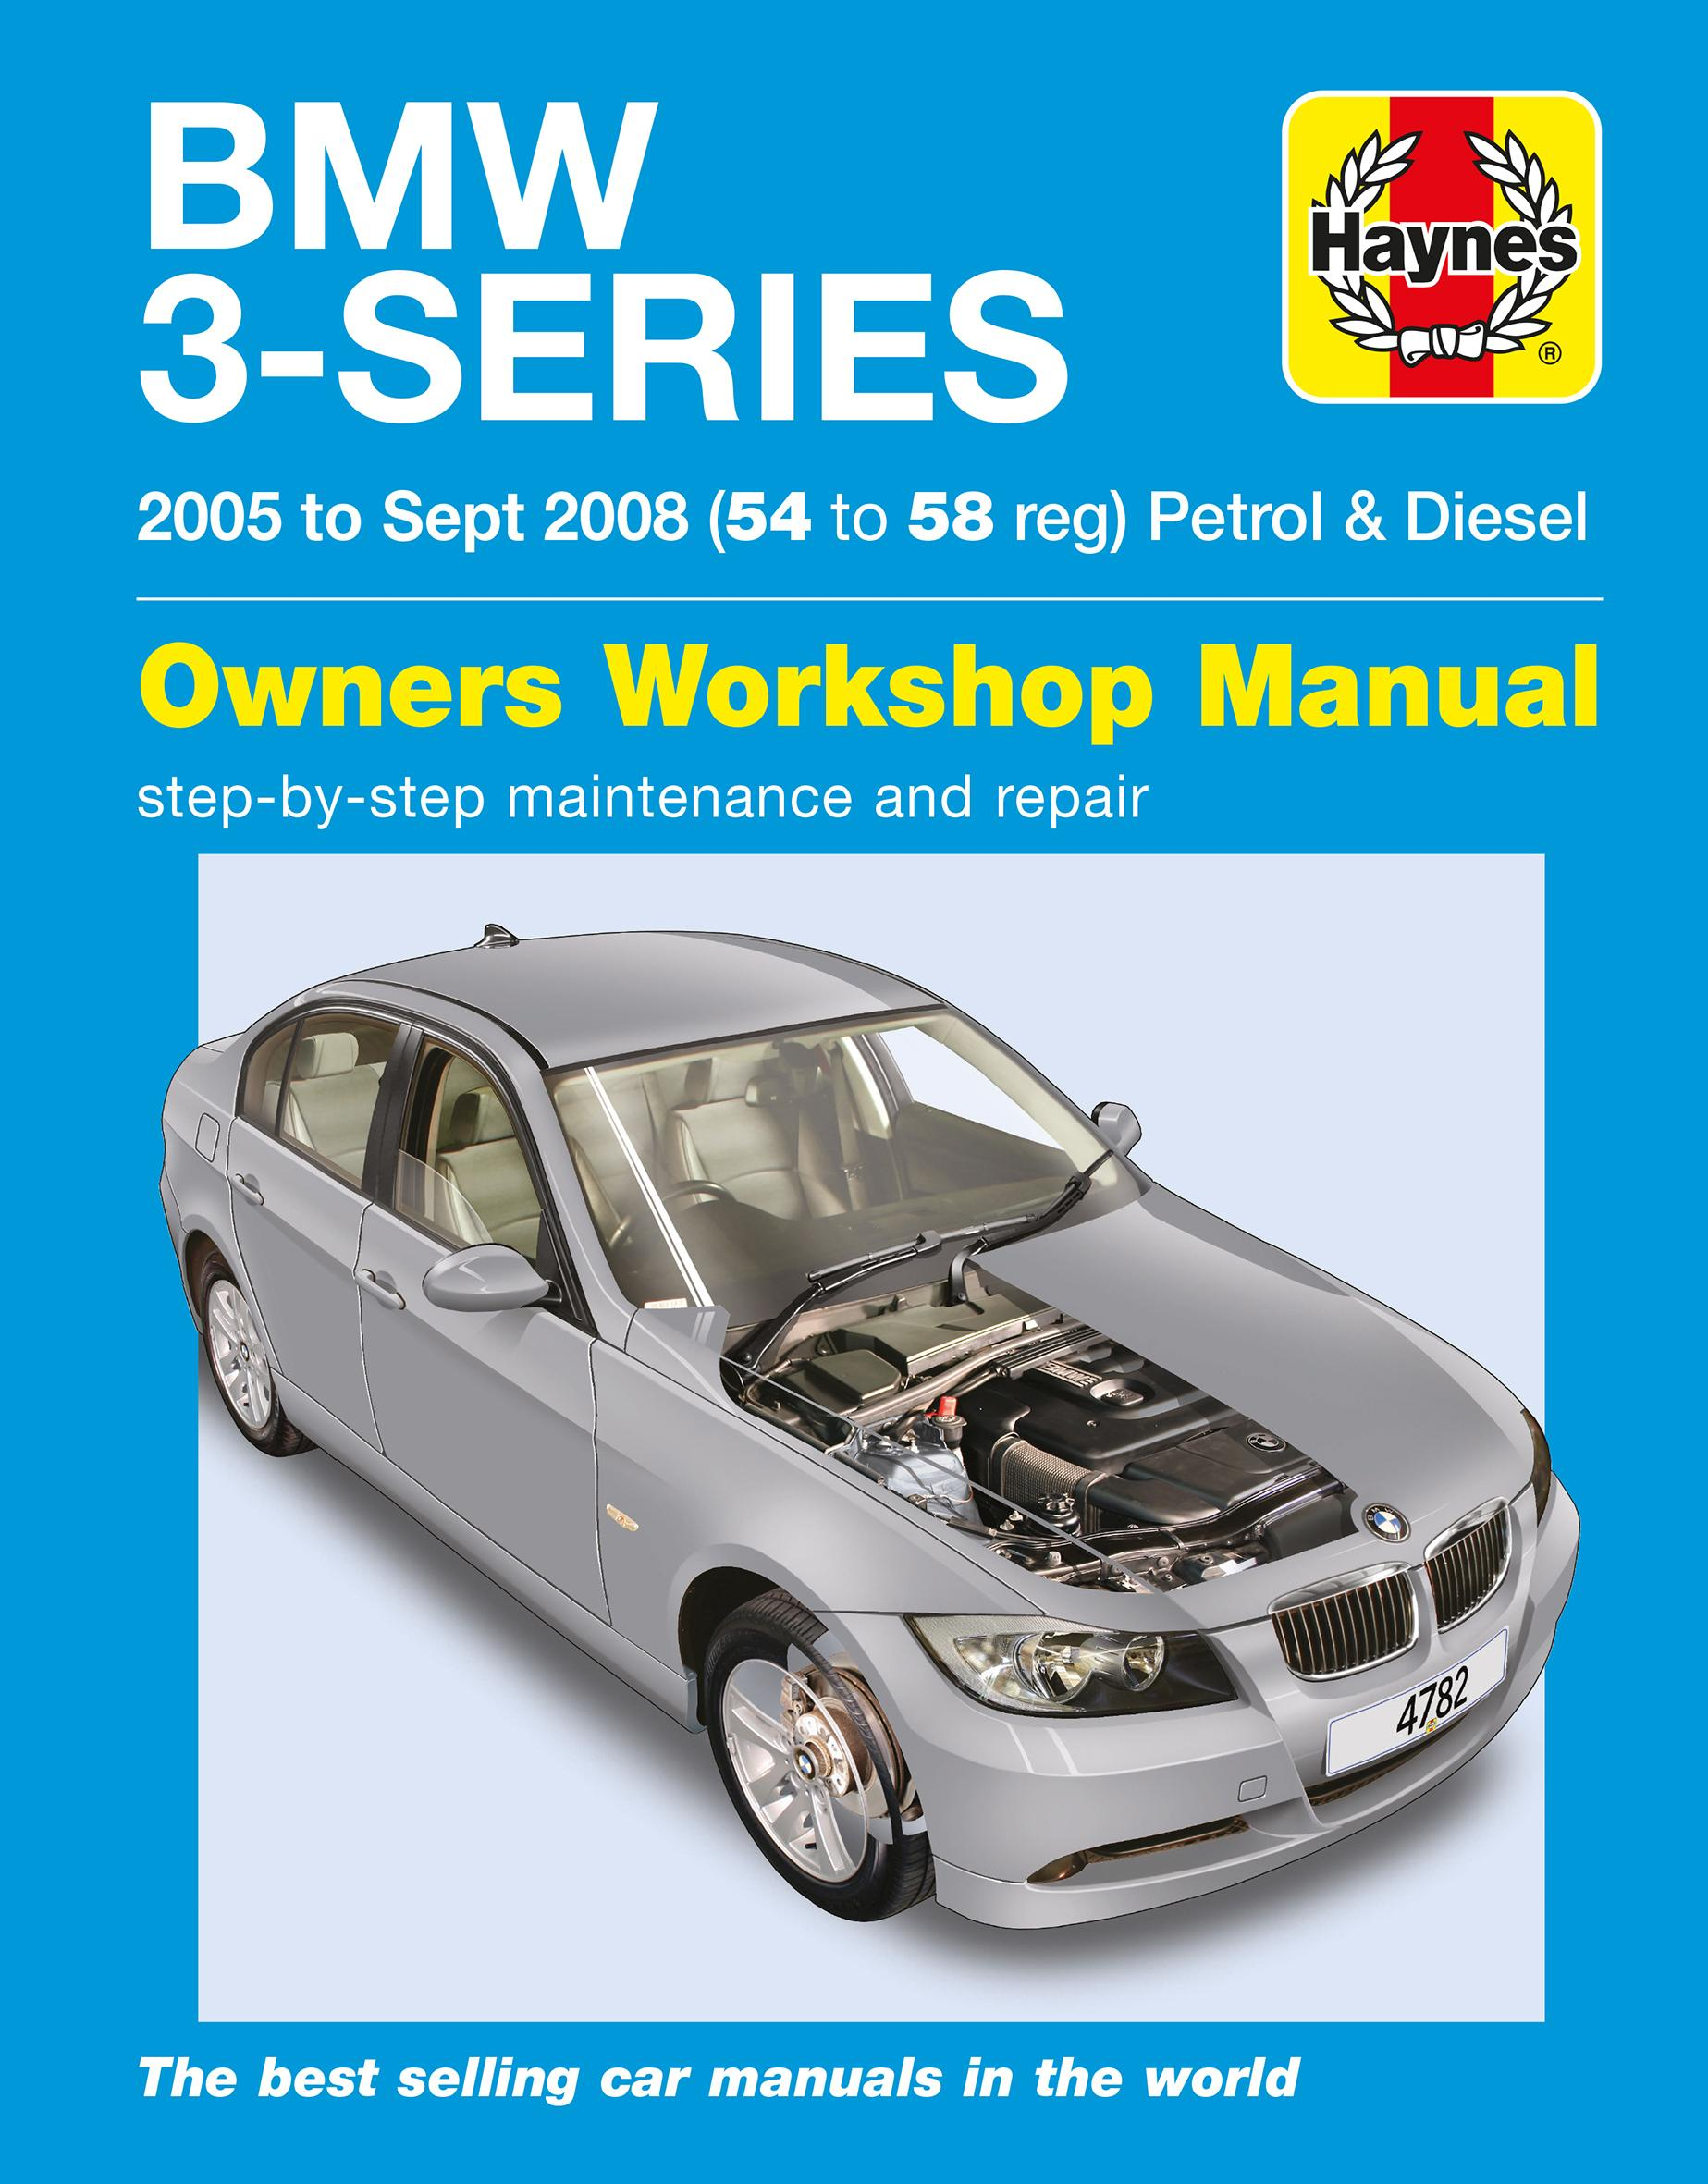 haynes bmw 3 series petrol diesel rh halfords com JD 318D Specs BMW 318D M Sport